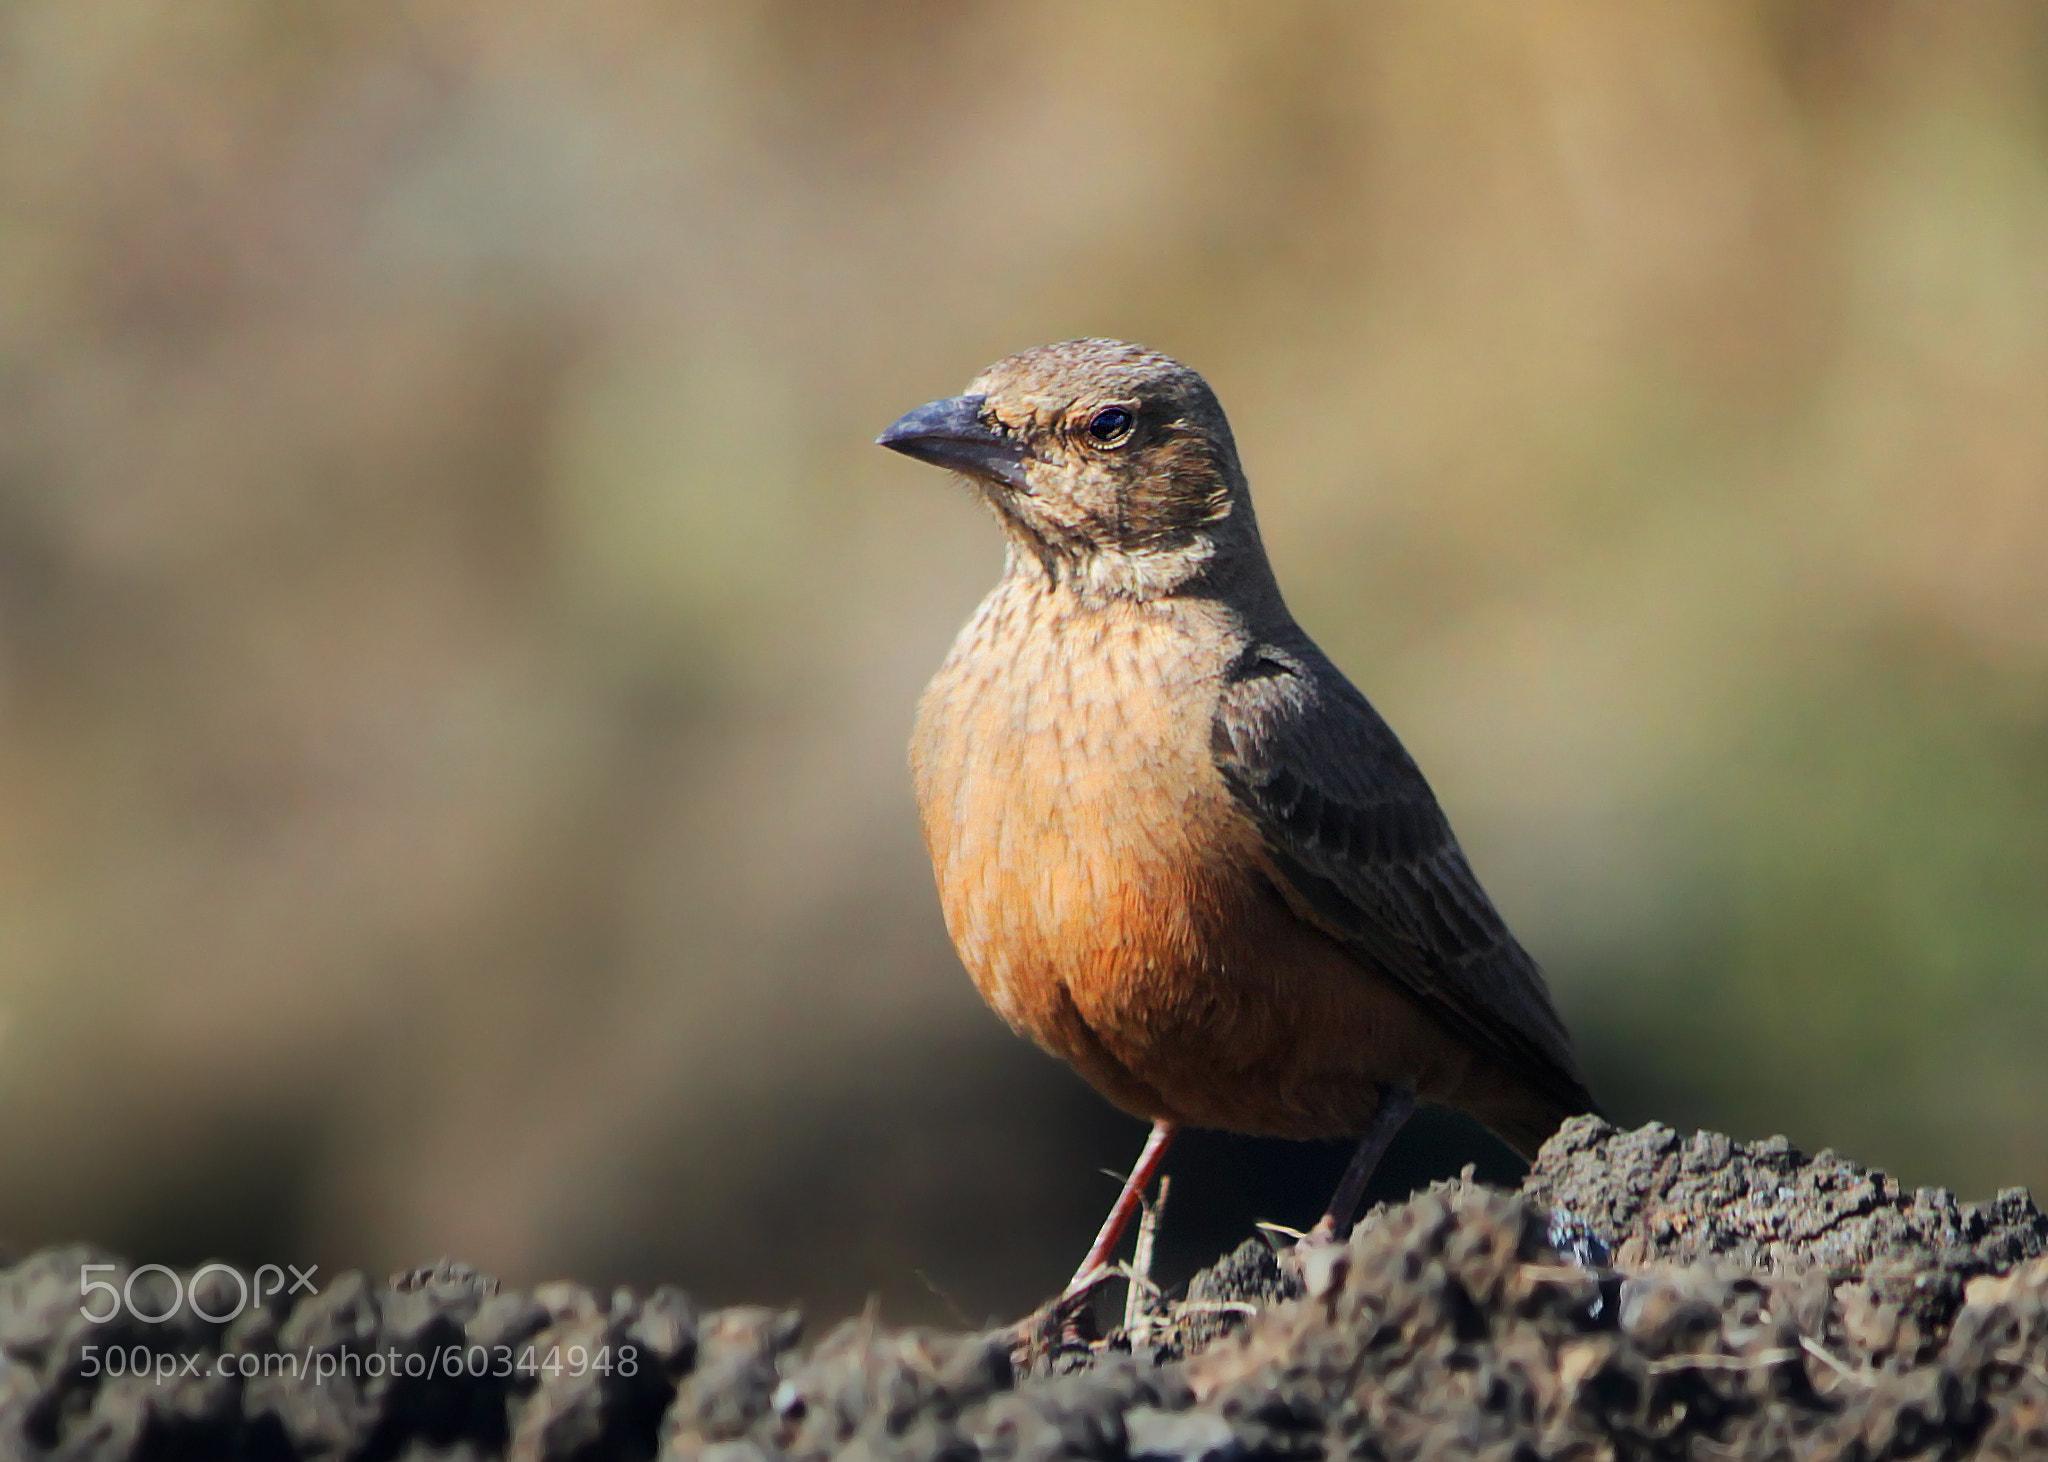 Photograph Brown bird by Subhash Masih on 500px